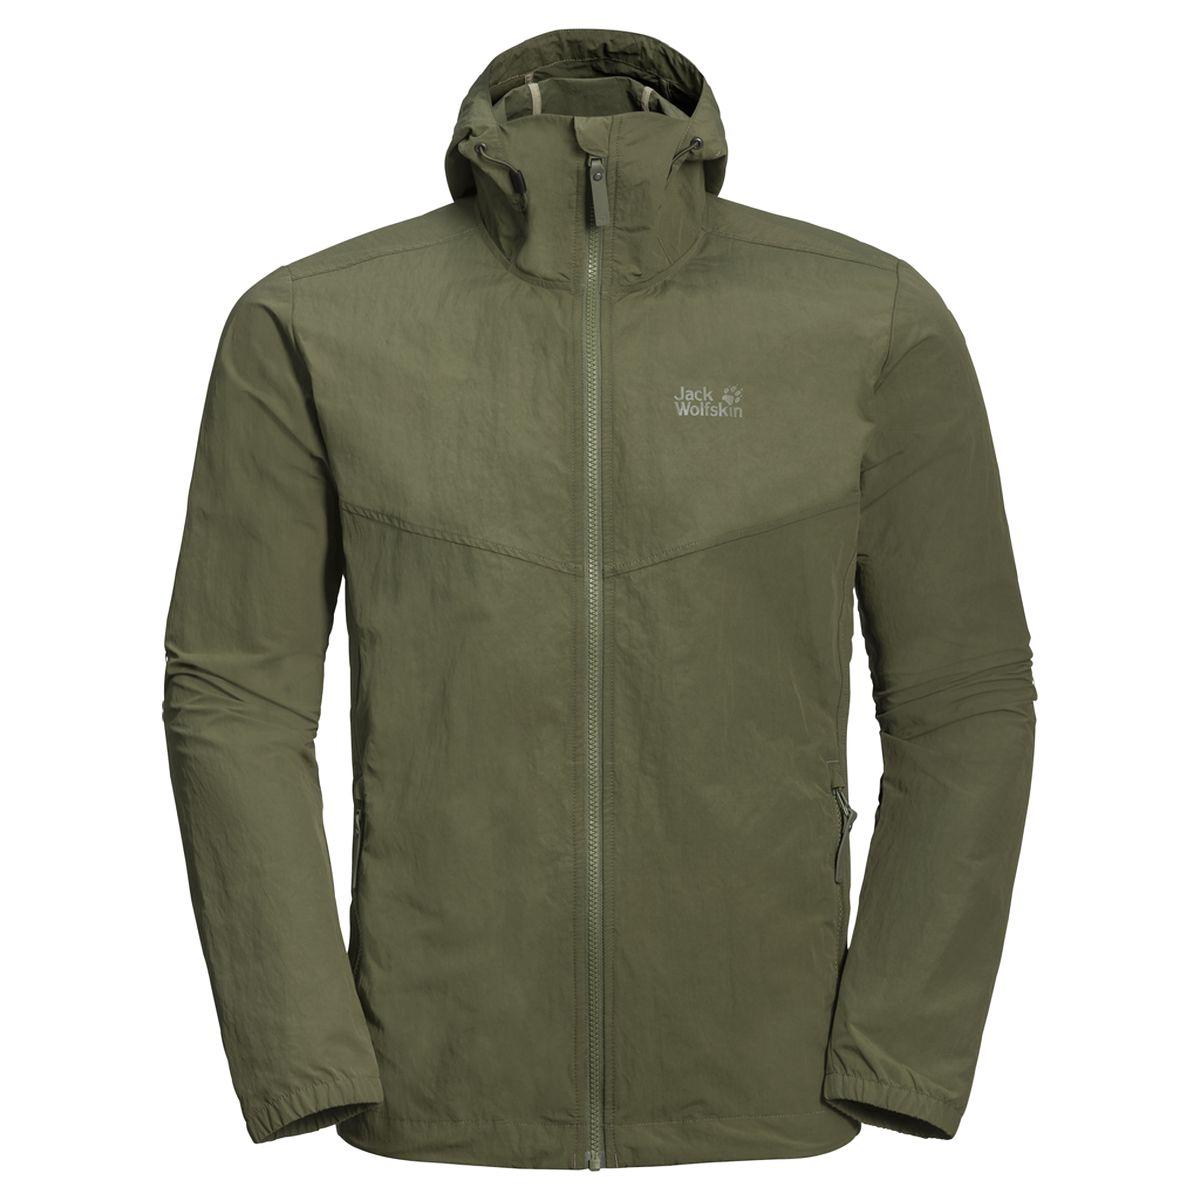 Фото - Куртка Jack Wolfskin Lakeside Jacket M 65 куртка